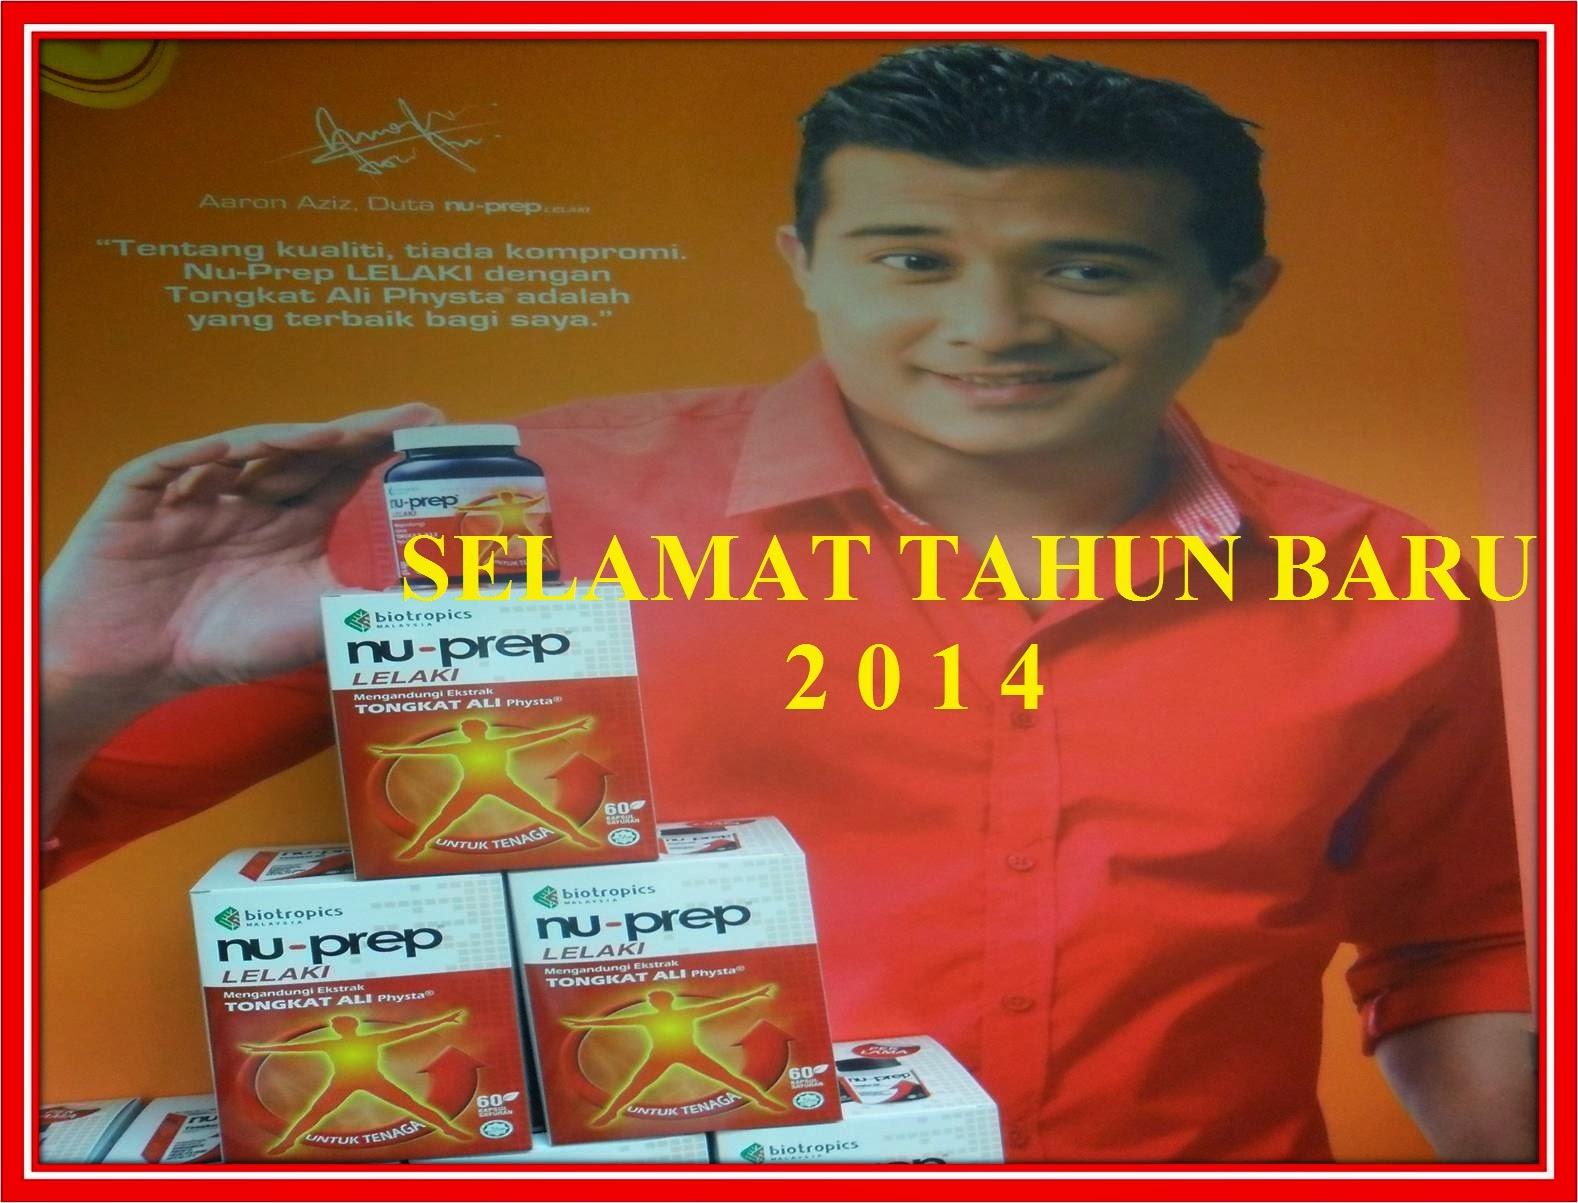 2014 pasti hanya Tongkat Ali Nu-Prep lelaki untuk ANDA